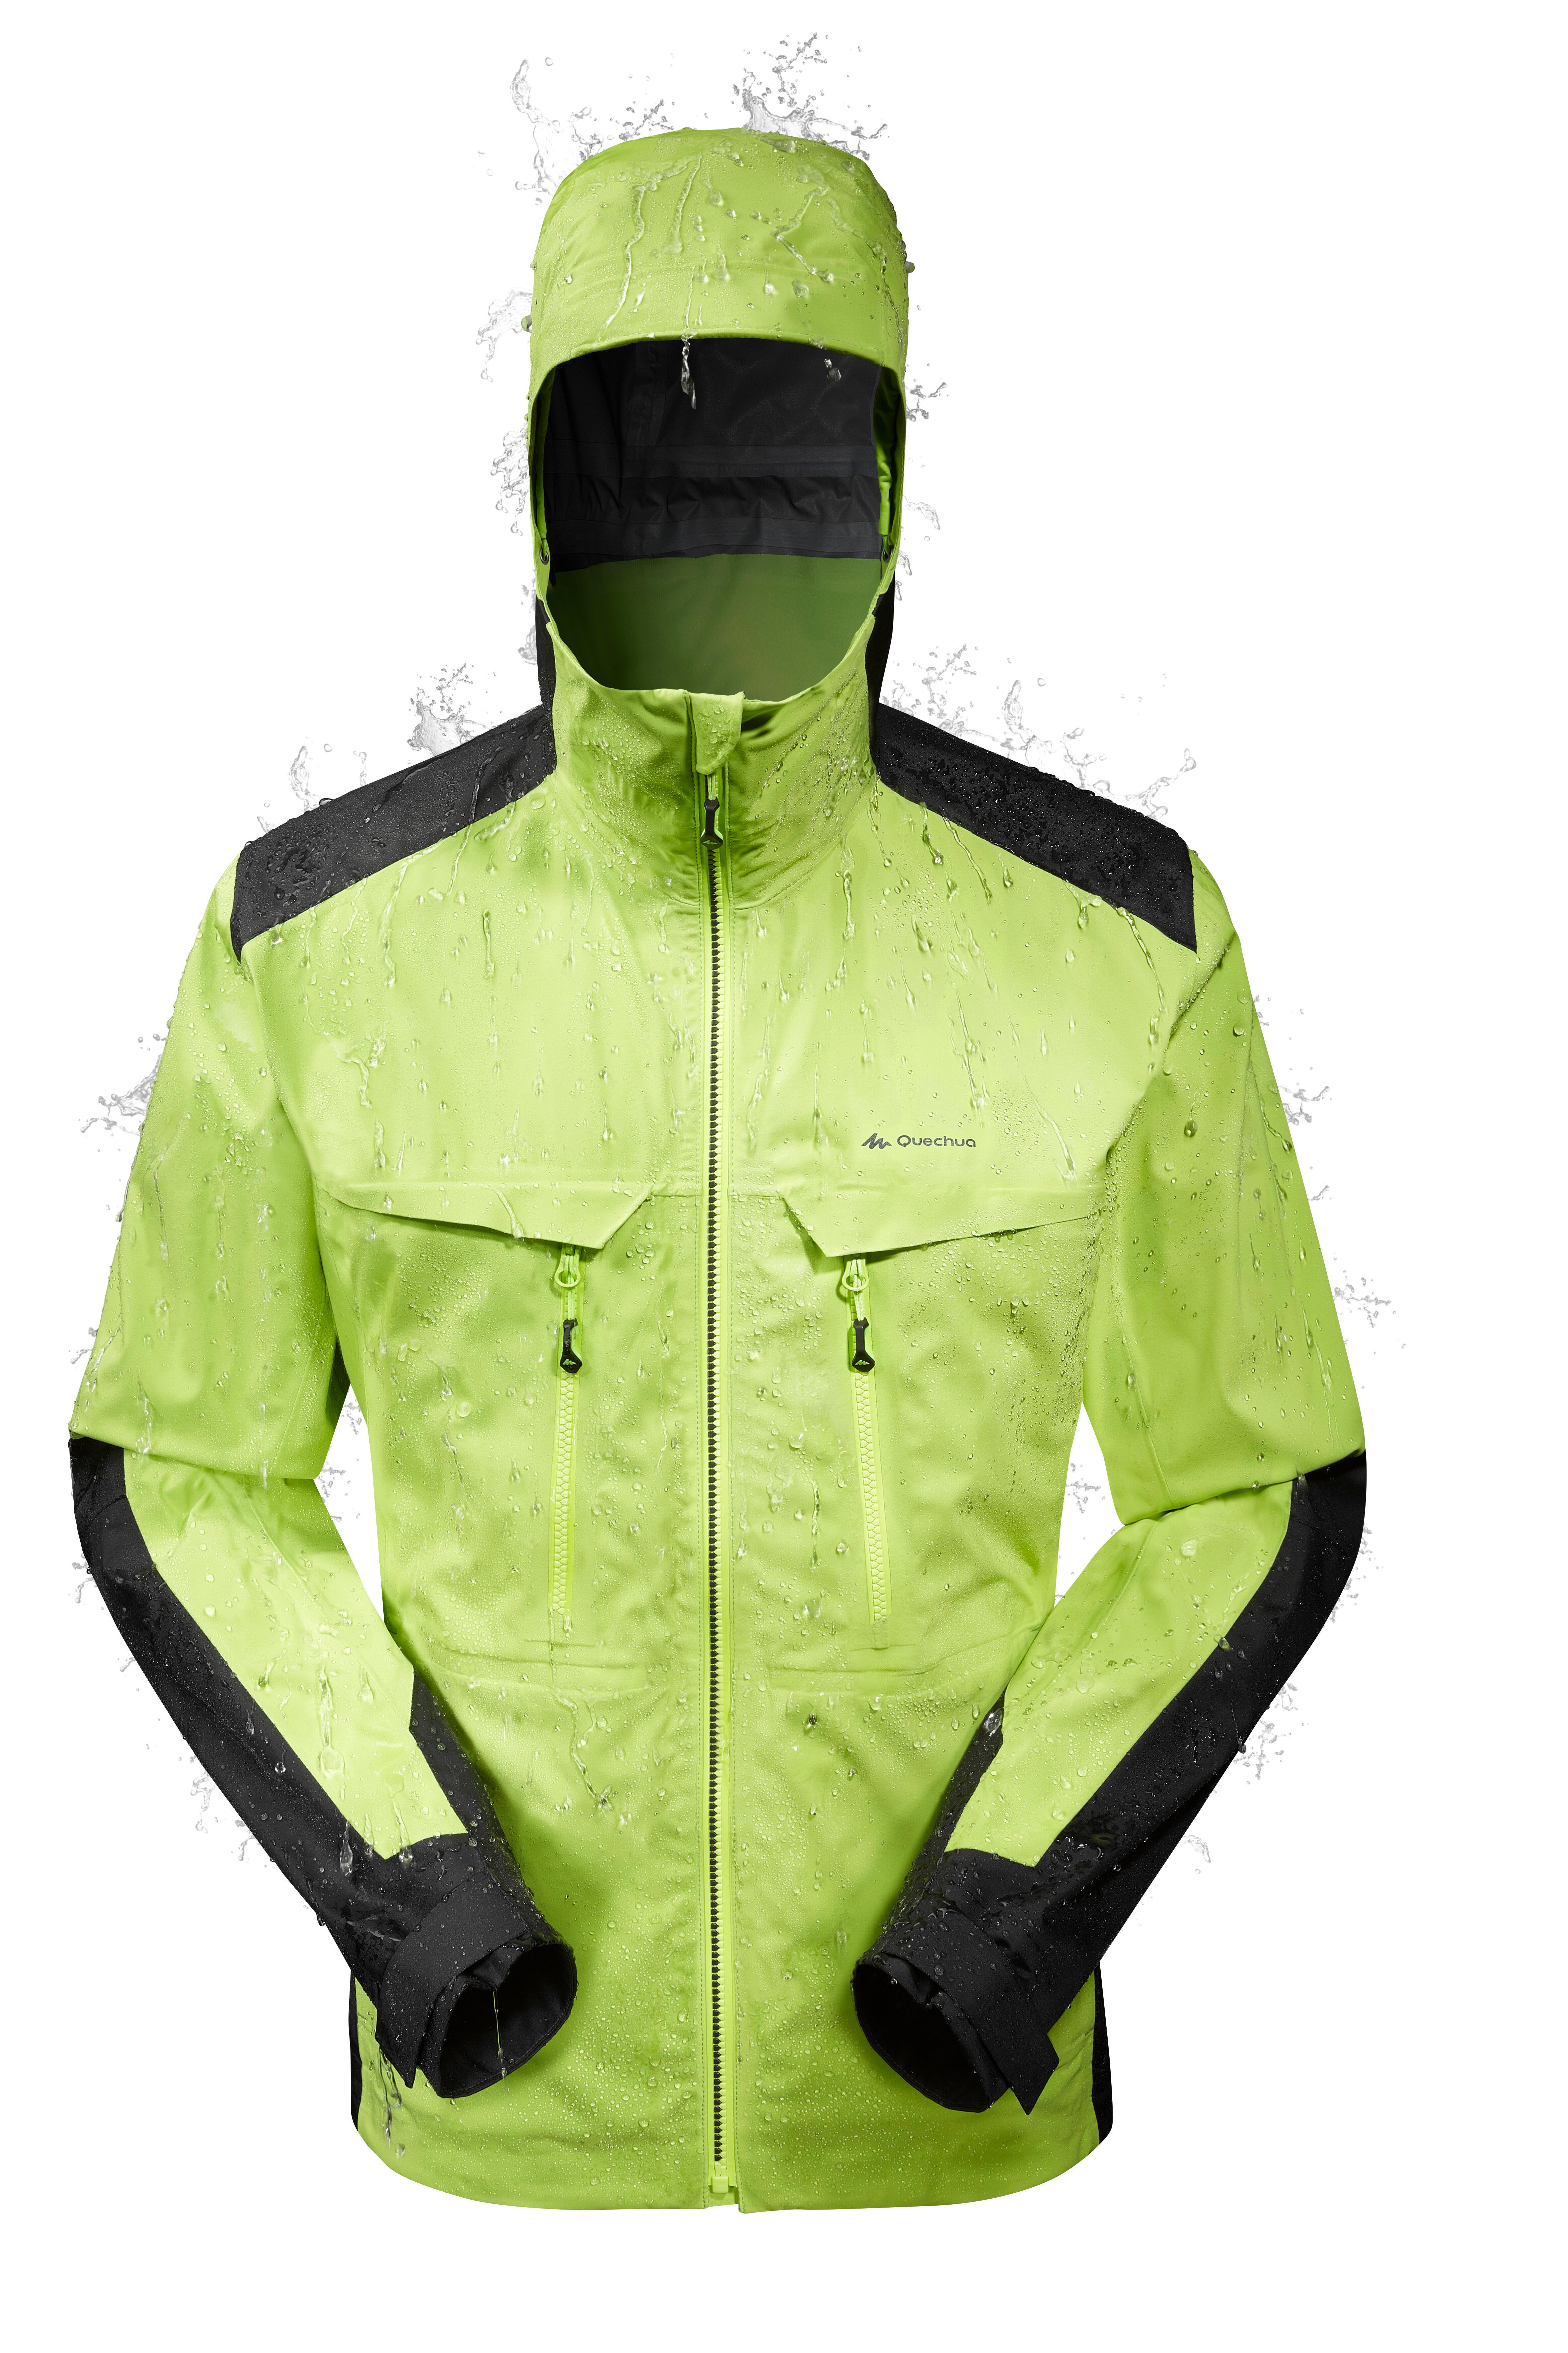 MH900 Men's Waterproof Mountain Hiking Rain Jacket - Green Black